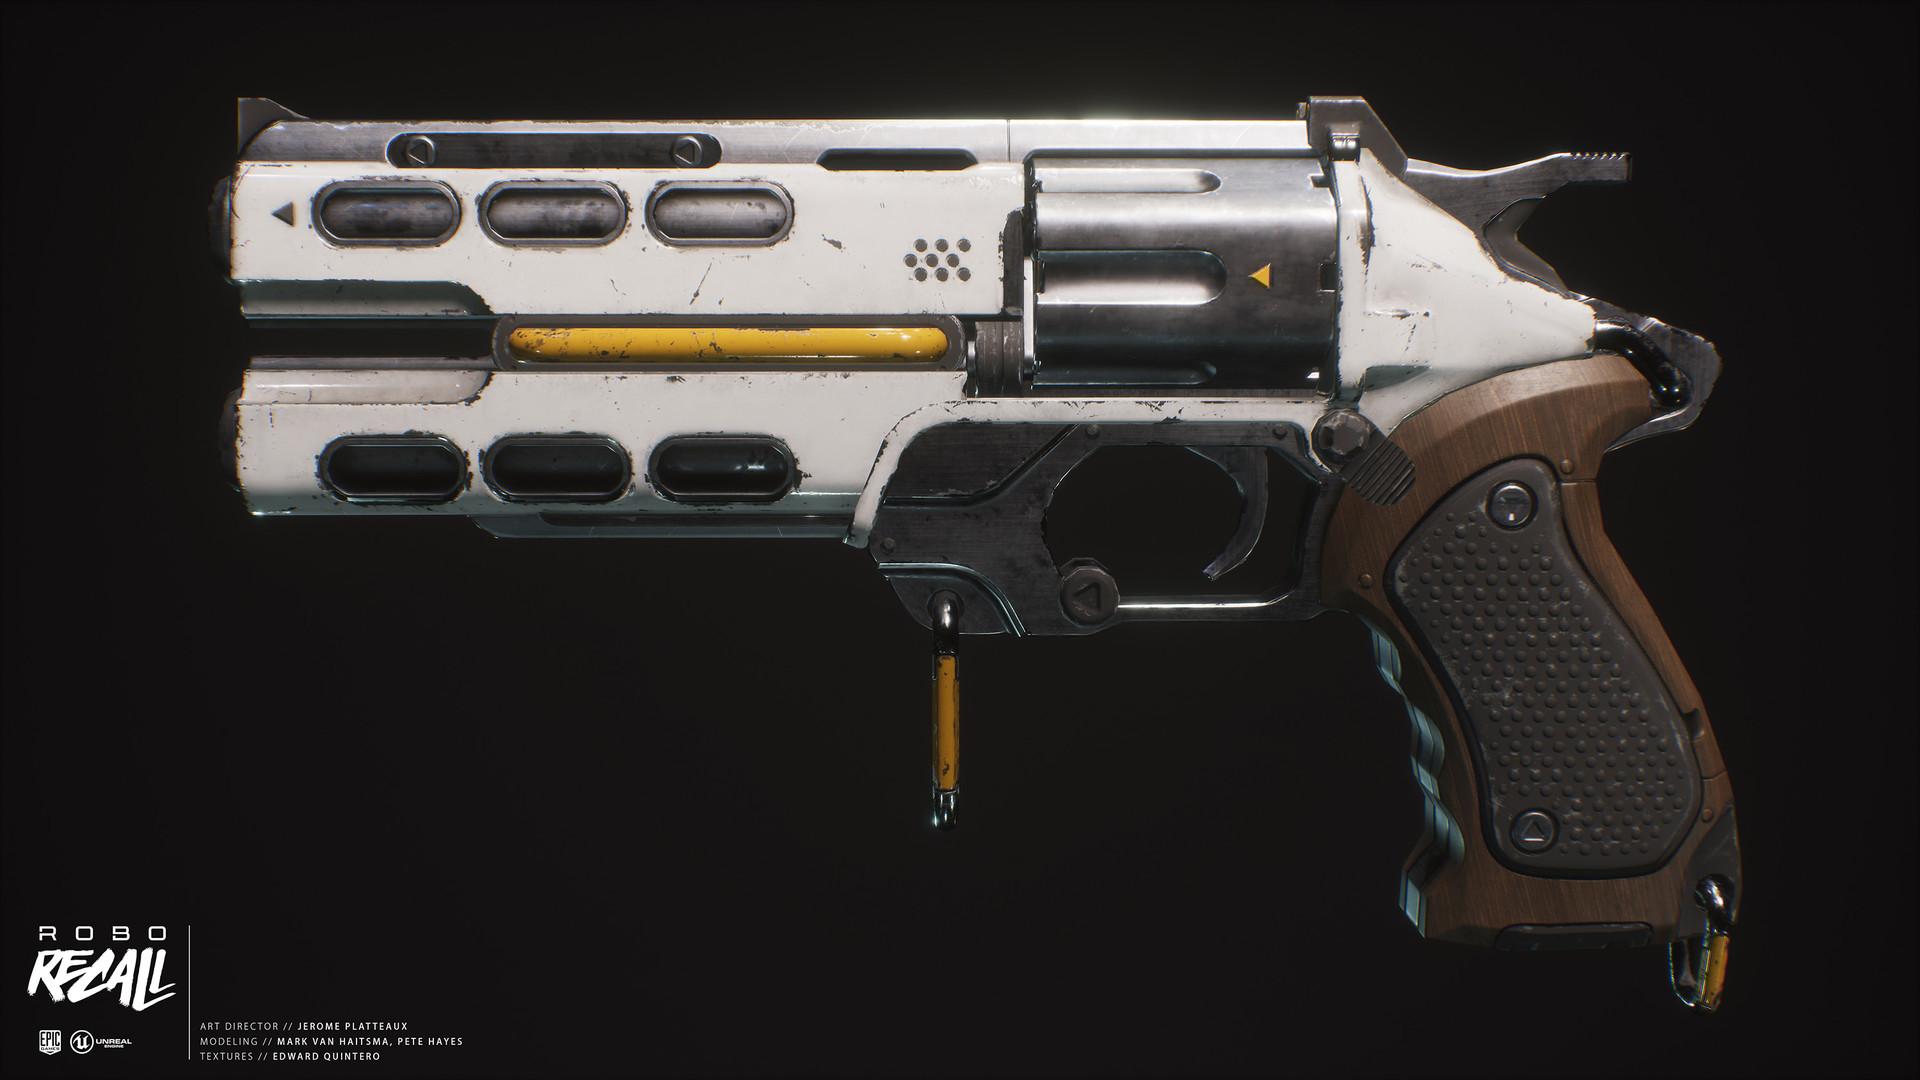 Mark van haitsma revolver 04